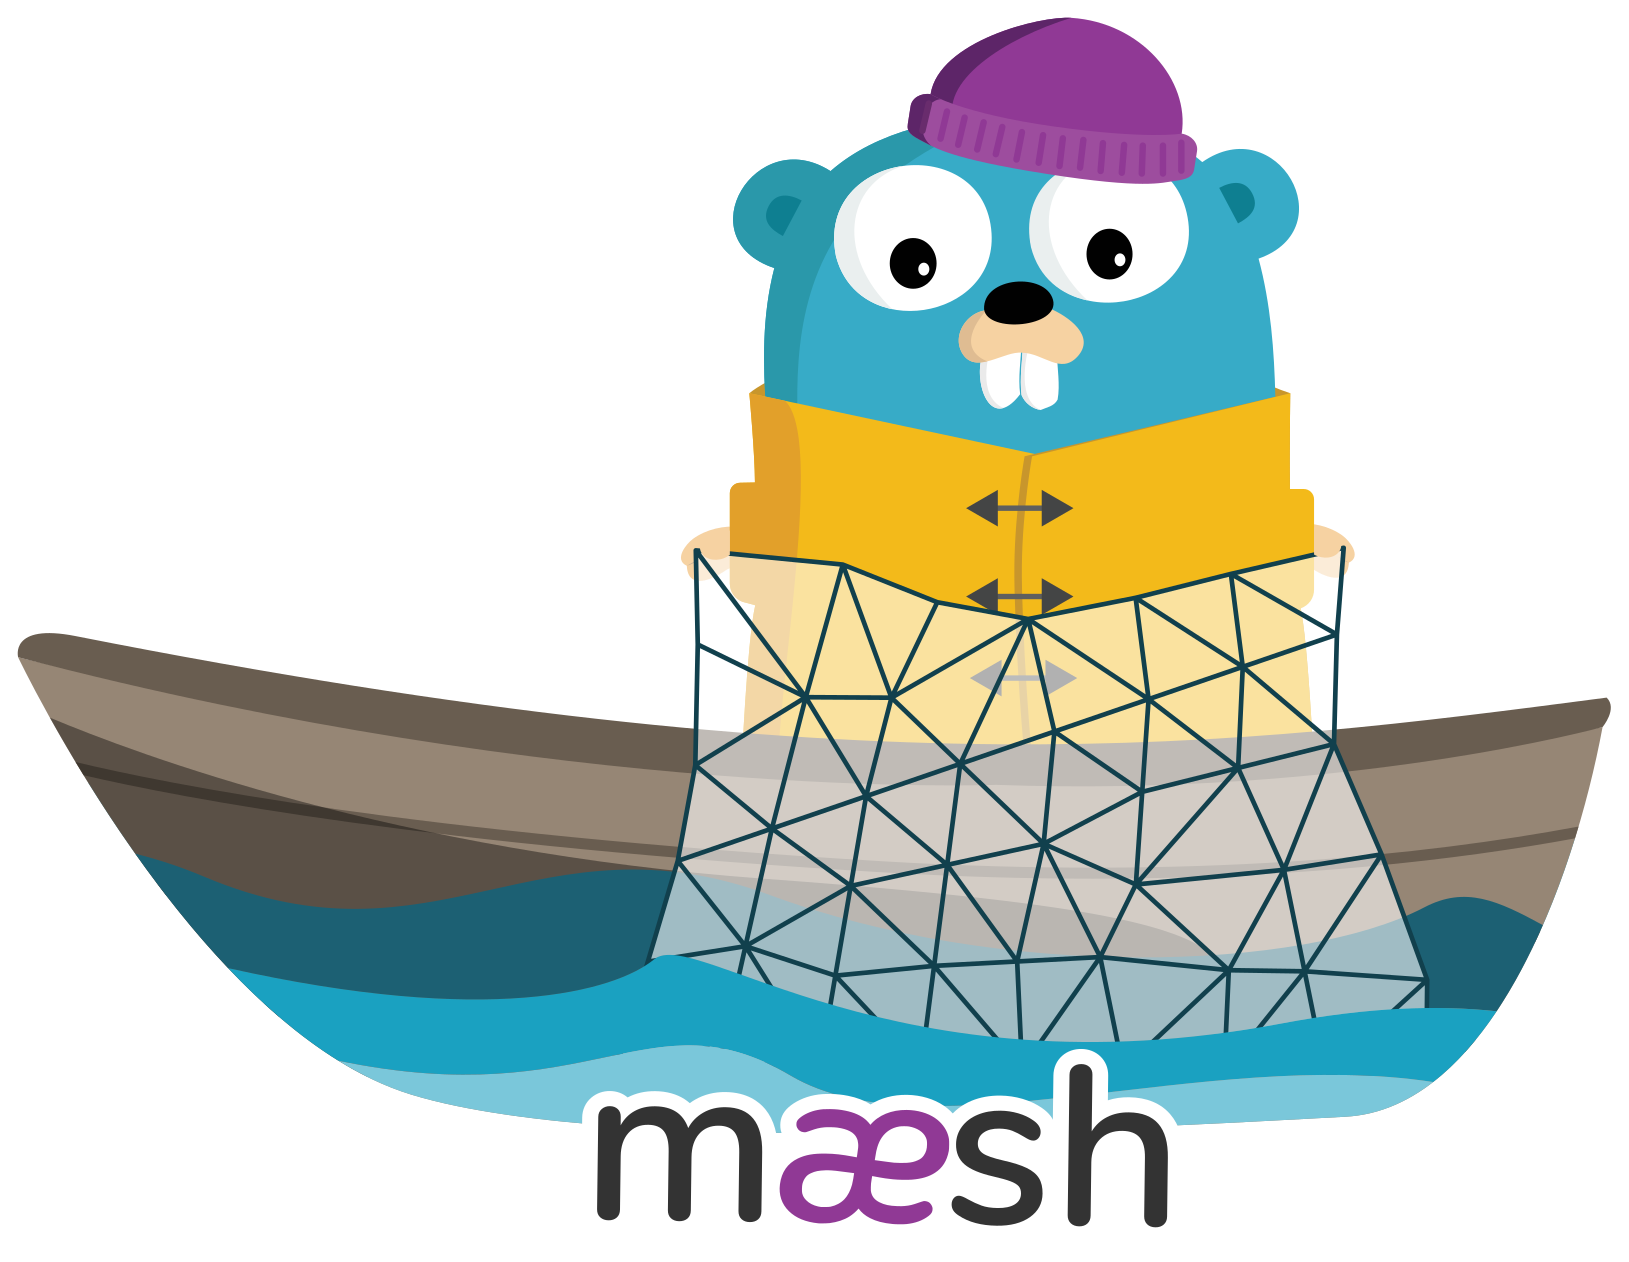 Maesh